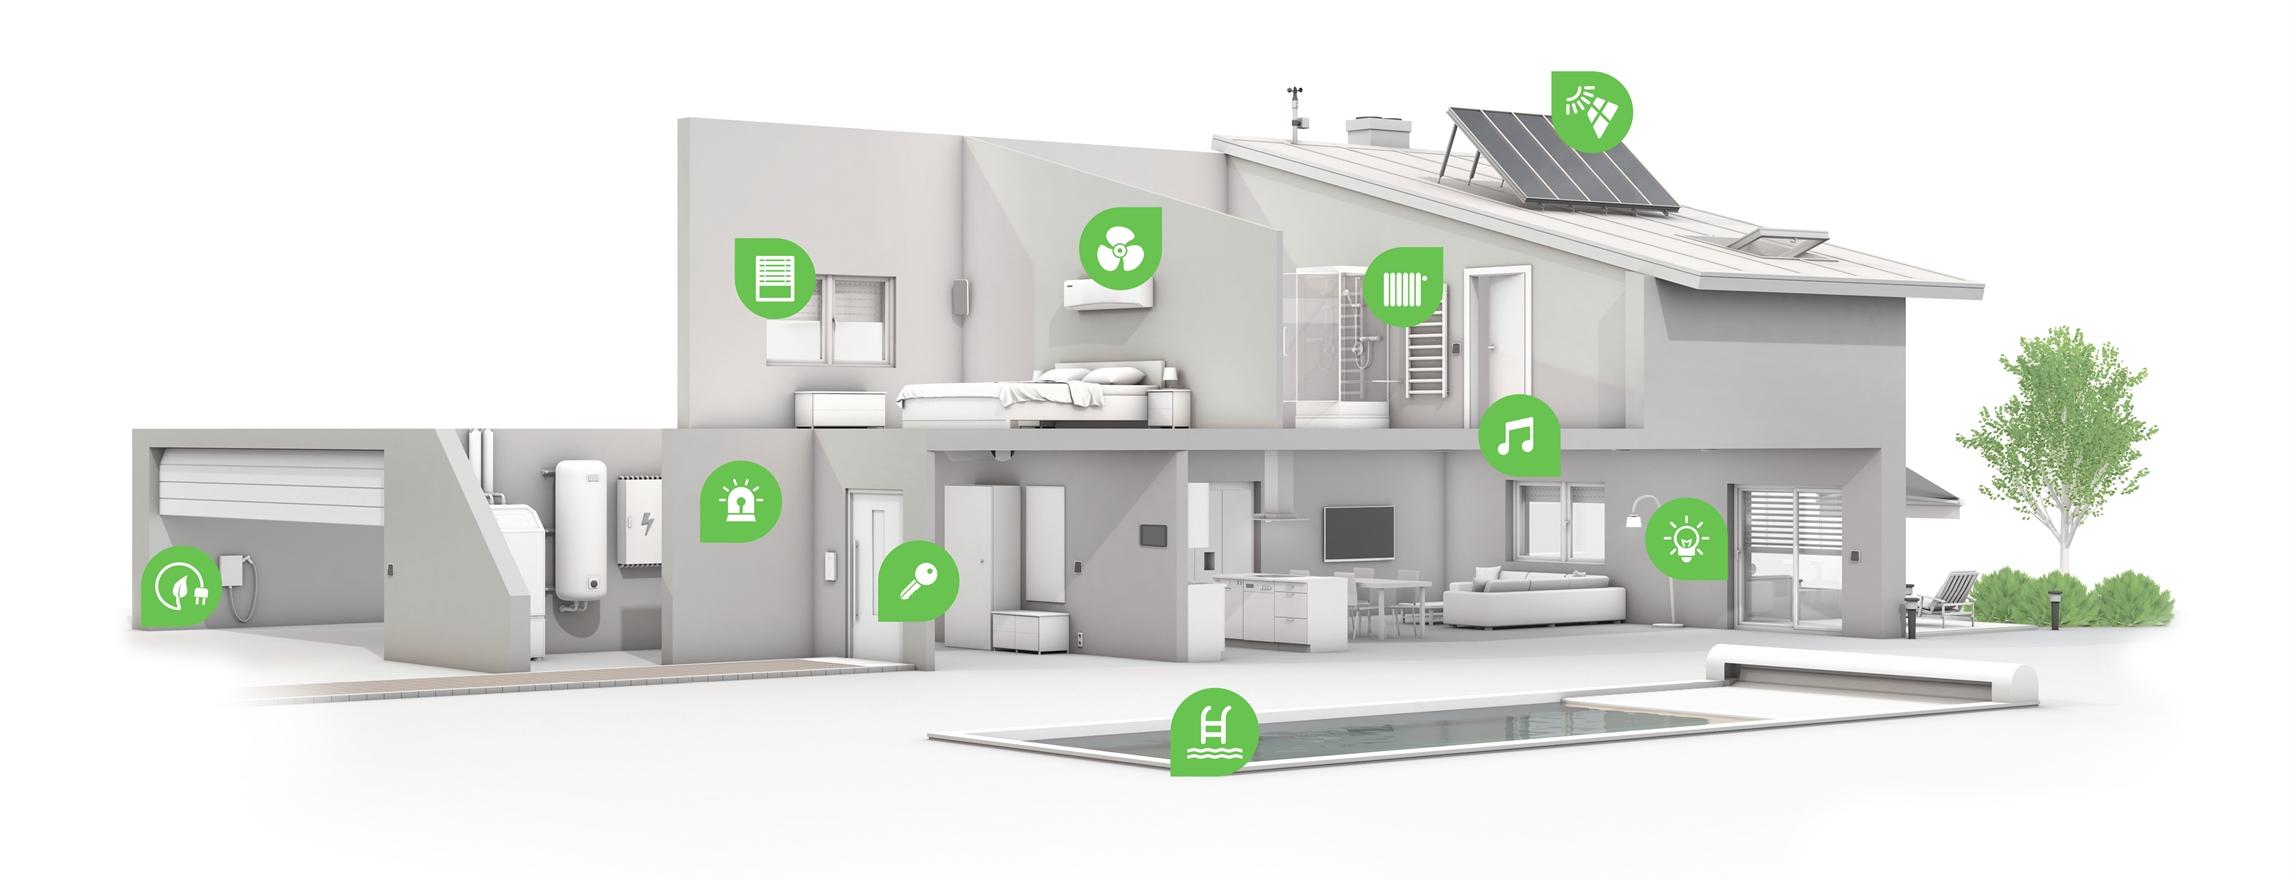 Smart Lighting | Intelligent Lighting Control & Lighting Moods For ...